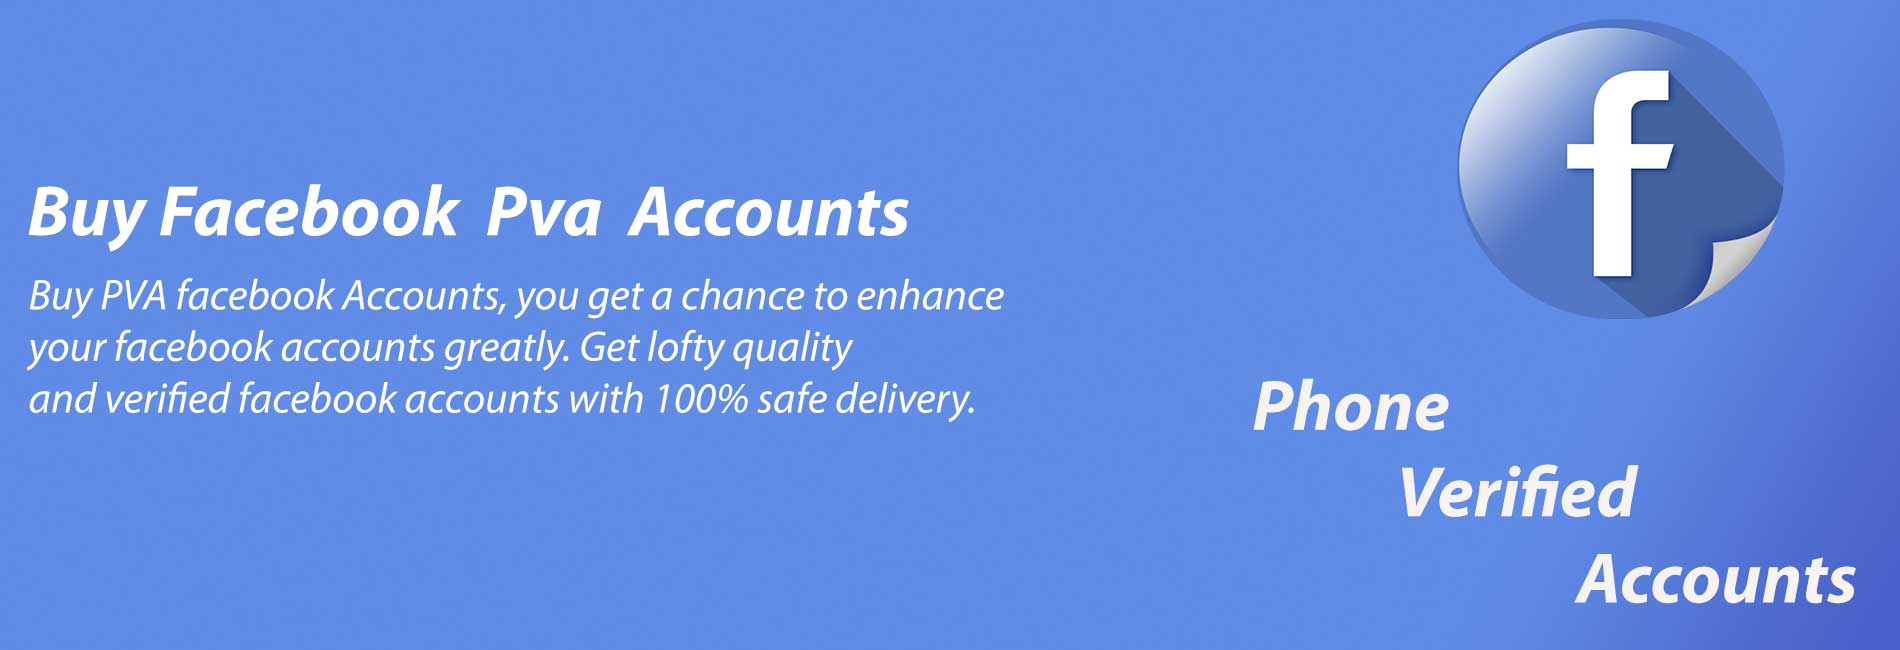 Facebook pva store - buy bulk phone verified facebook pva